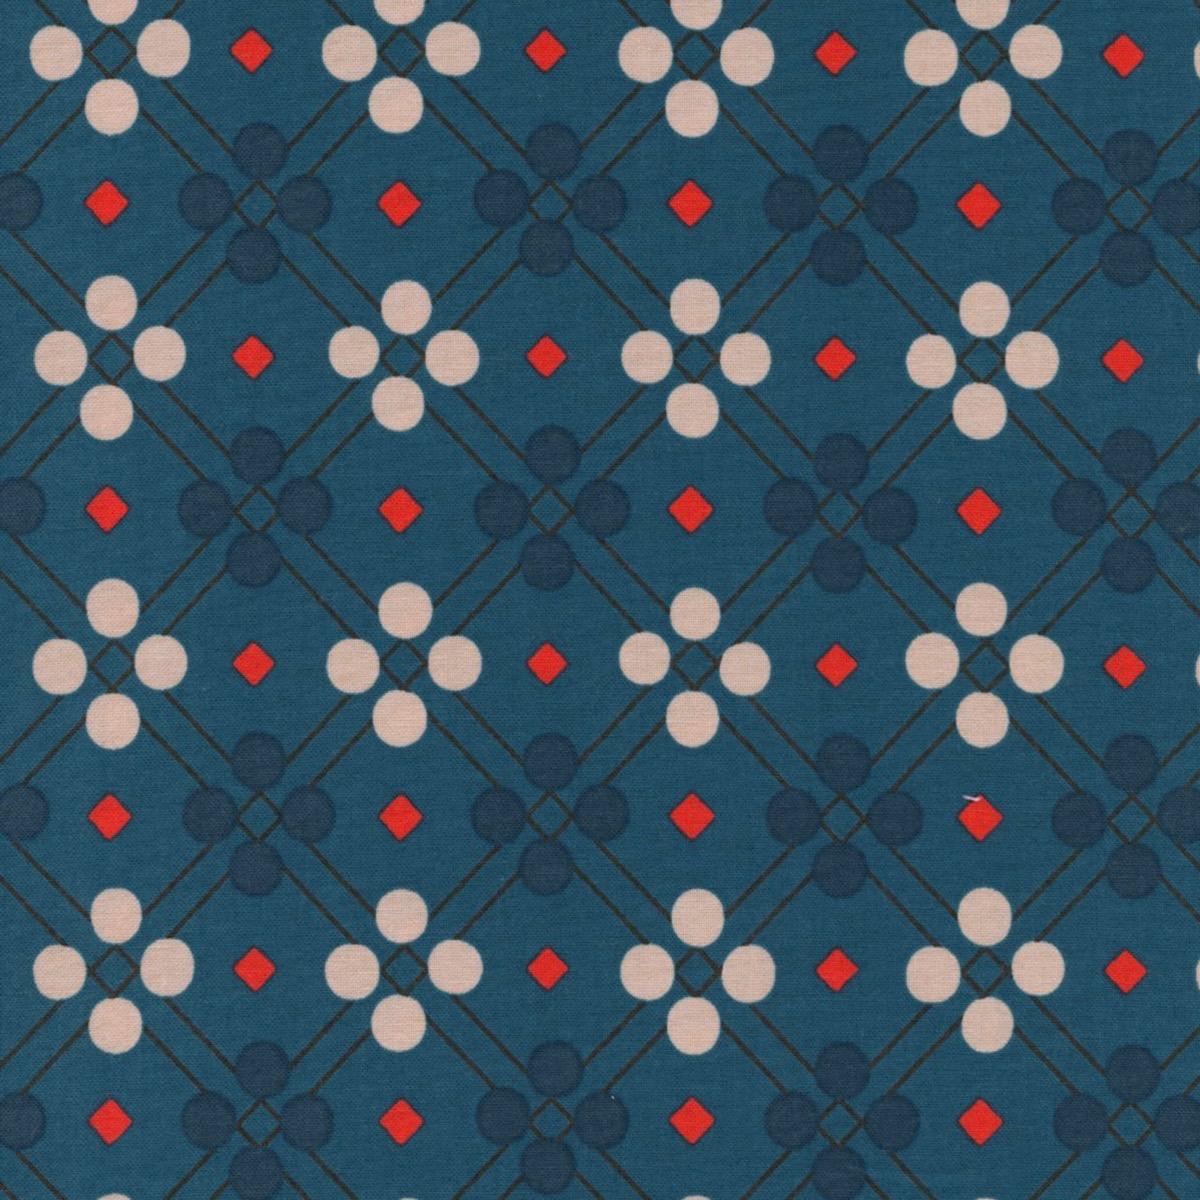 Cotton + Steel Picnic - Picnic Blanket (Teal)